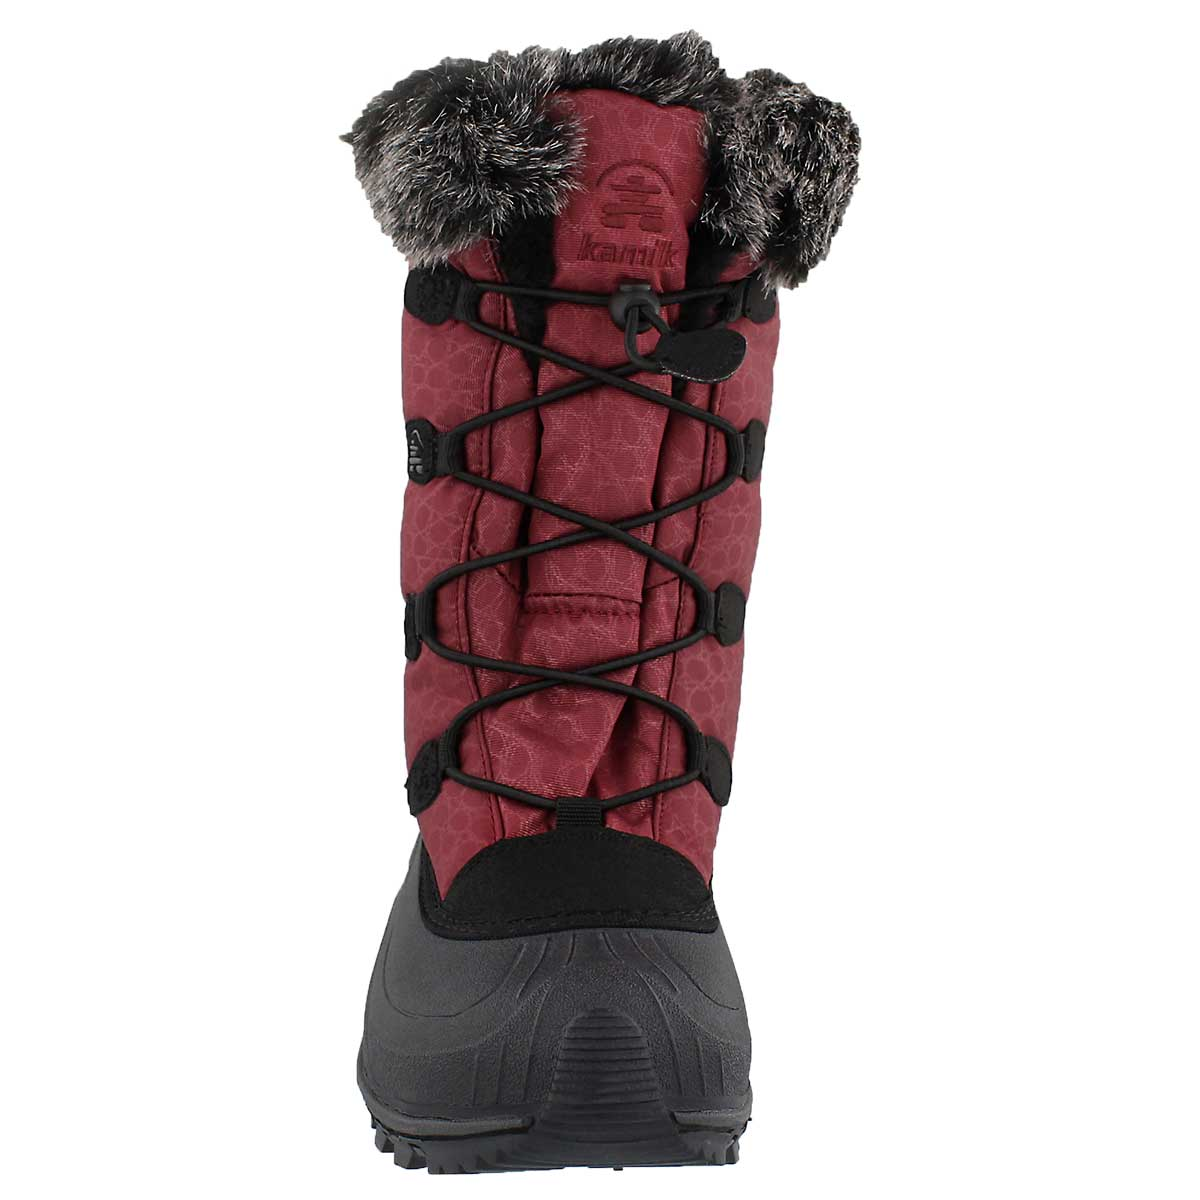 Lds Momentum burgundy winter boot